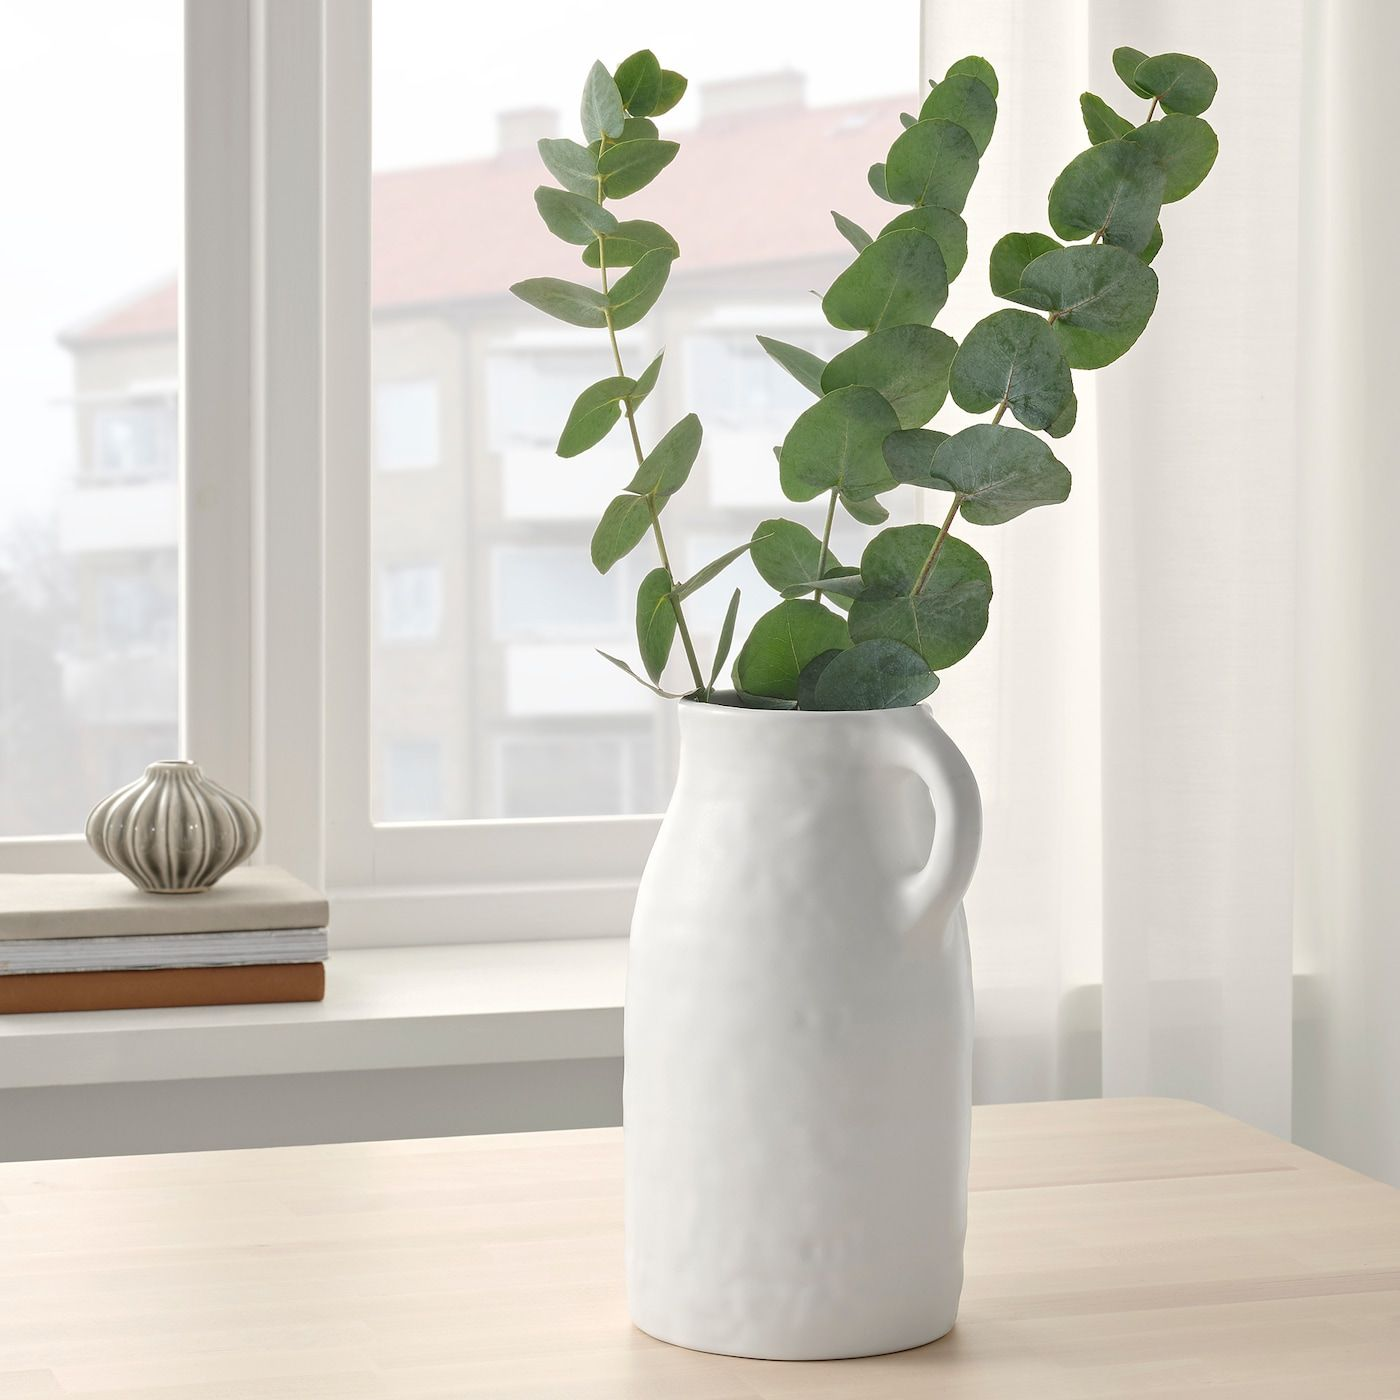 Pin By Kathleen Edison On House In 2021 Ikea Vases Vase Scandinavian Vases